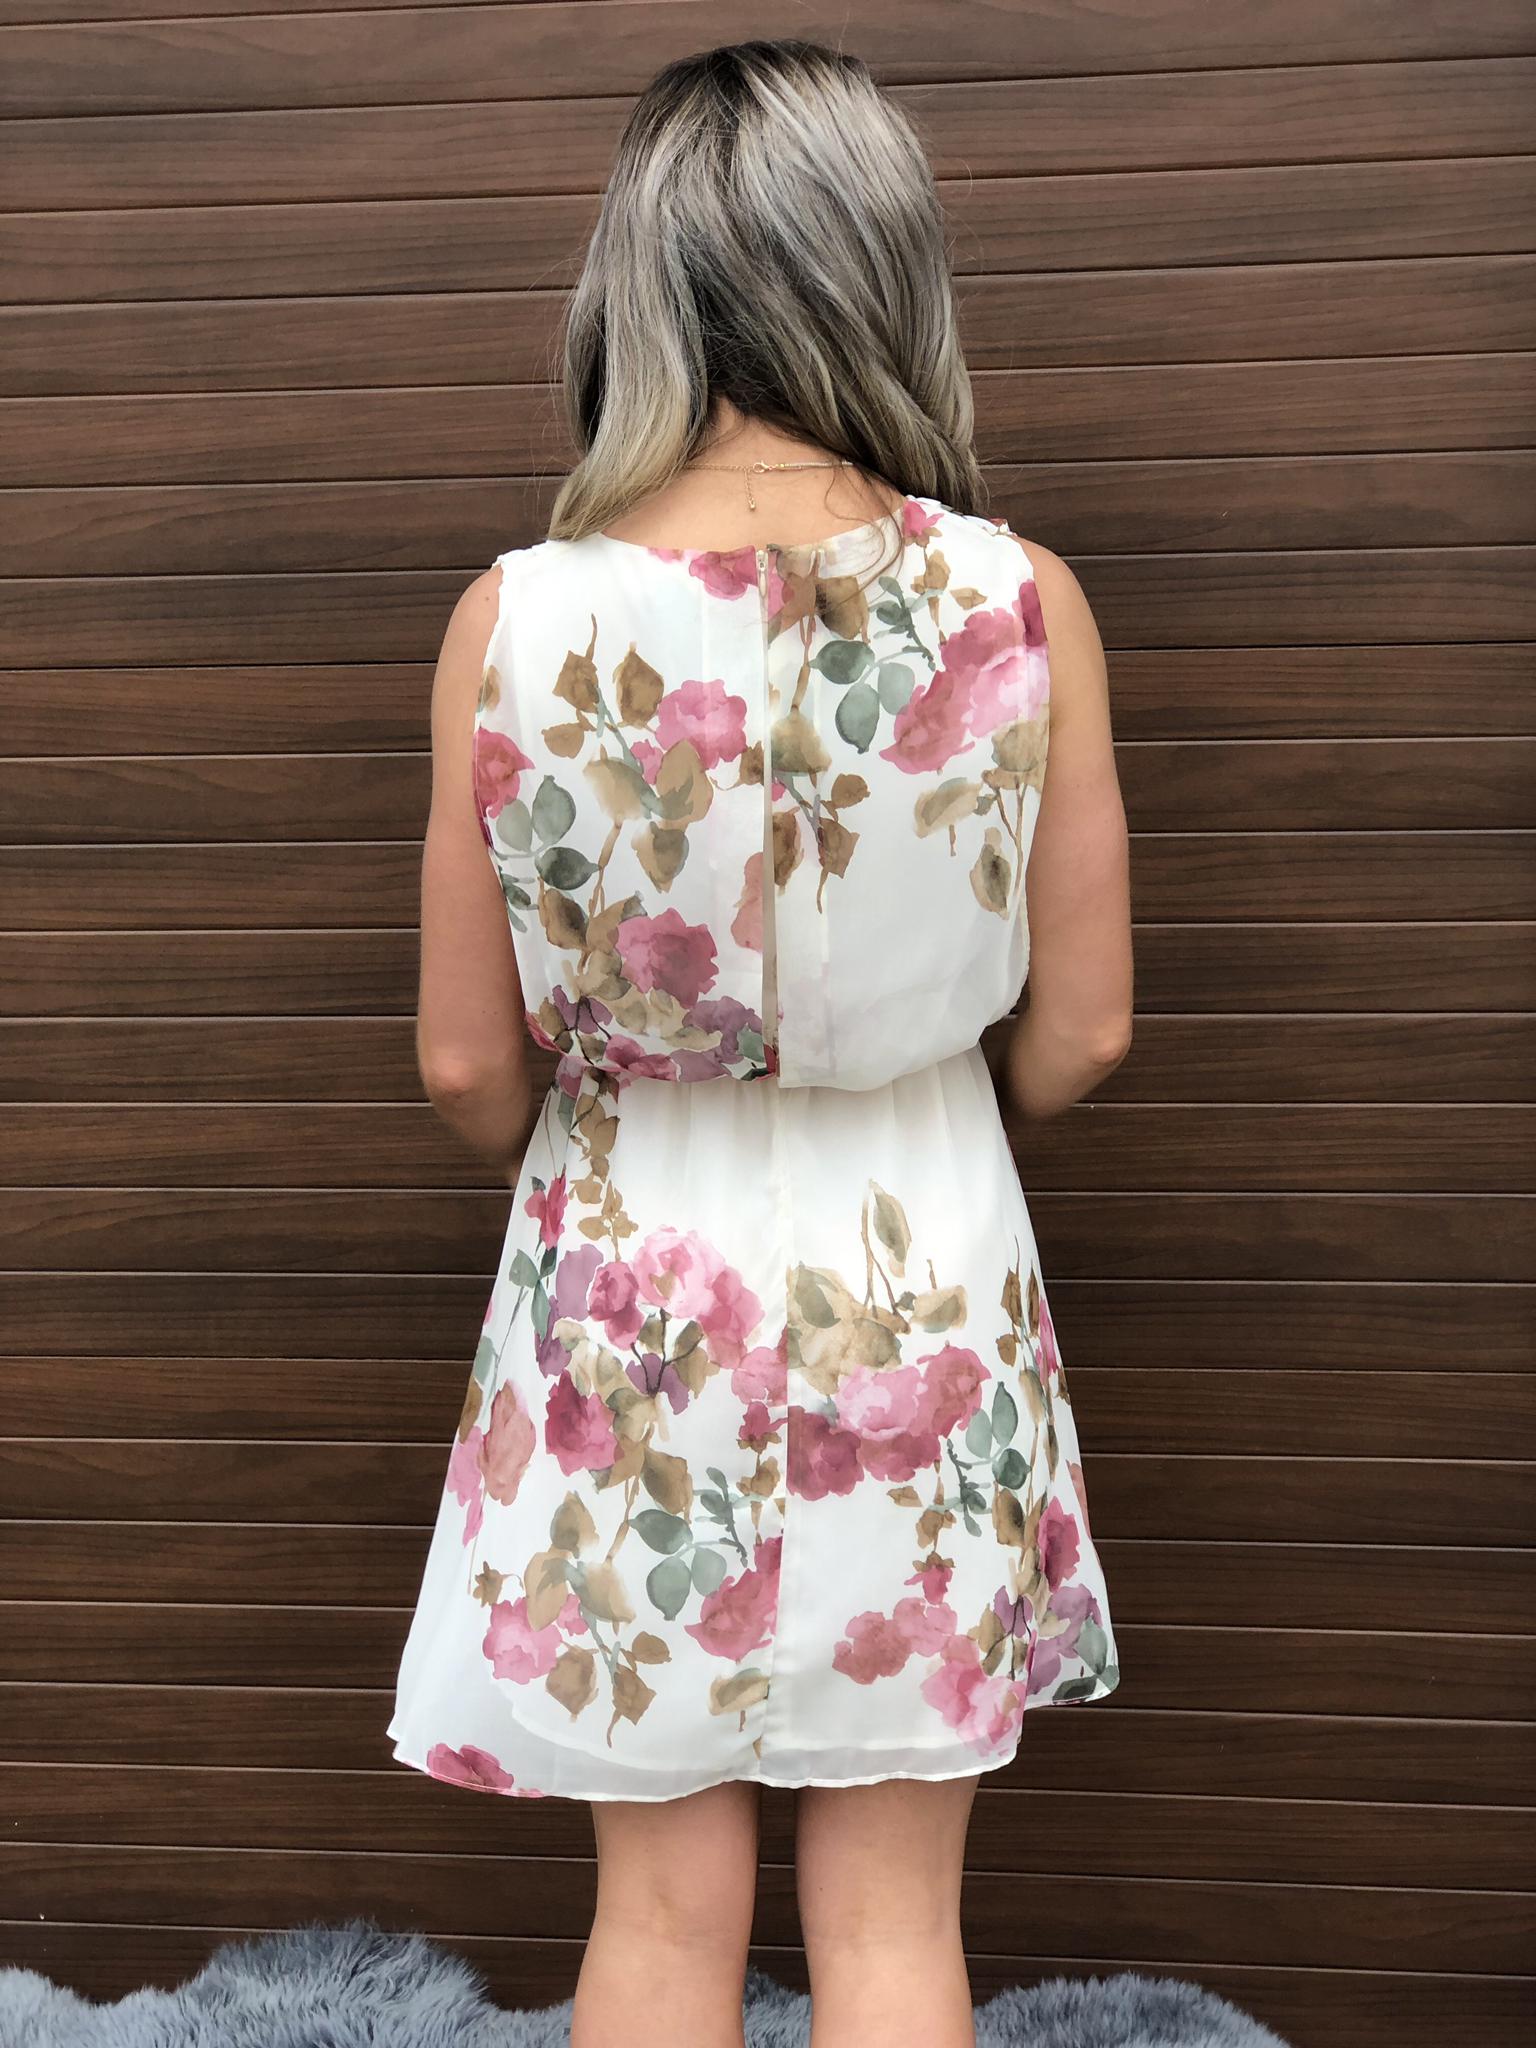 Ivory Blush Floral Dress